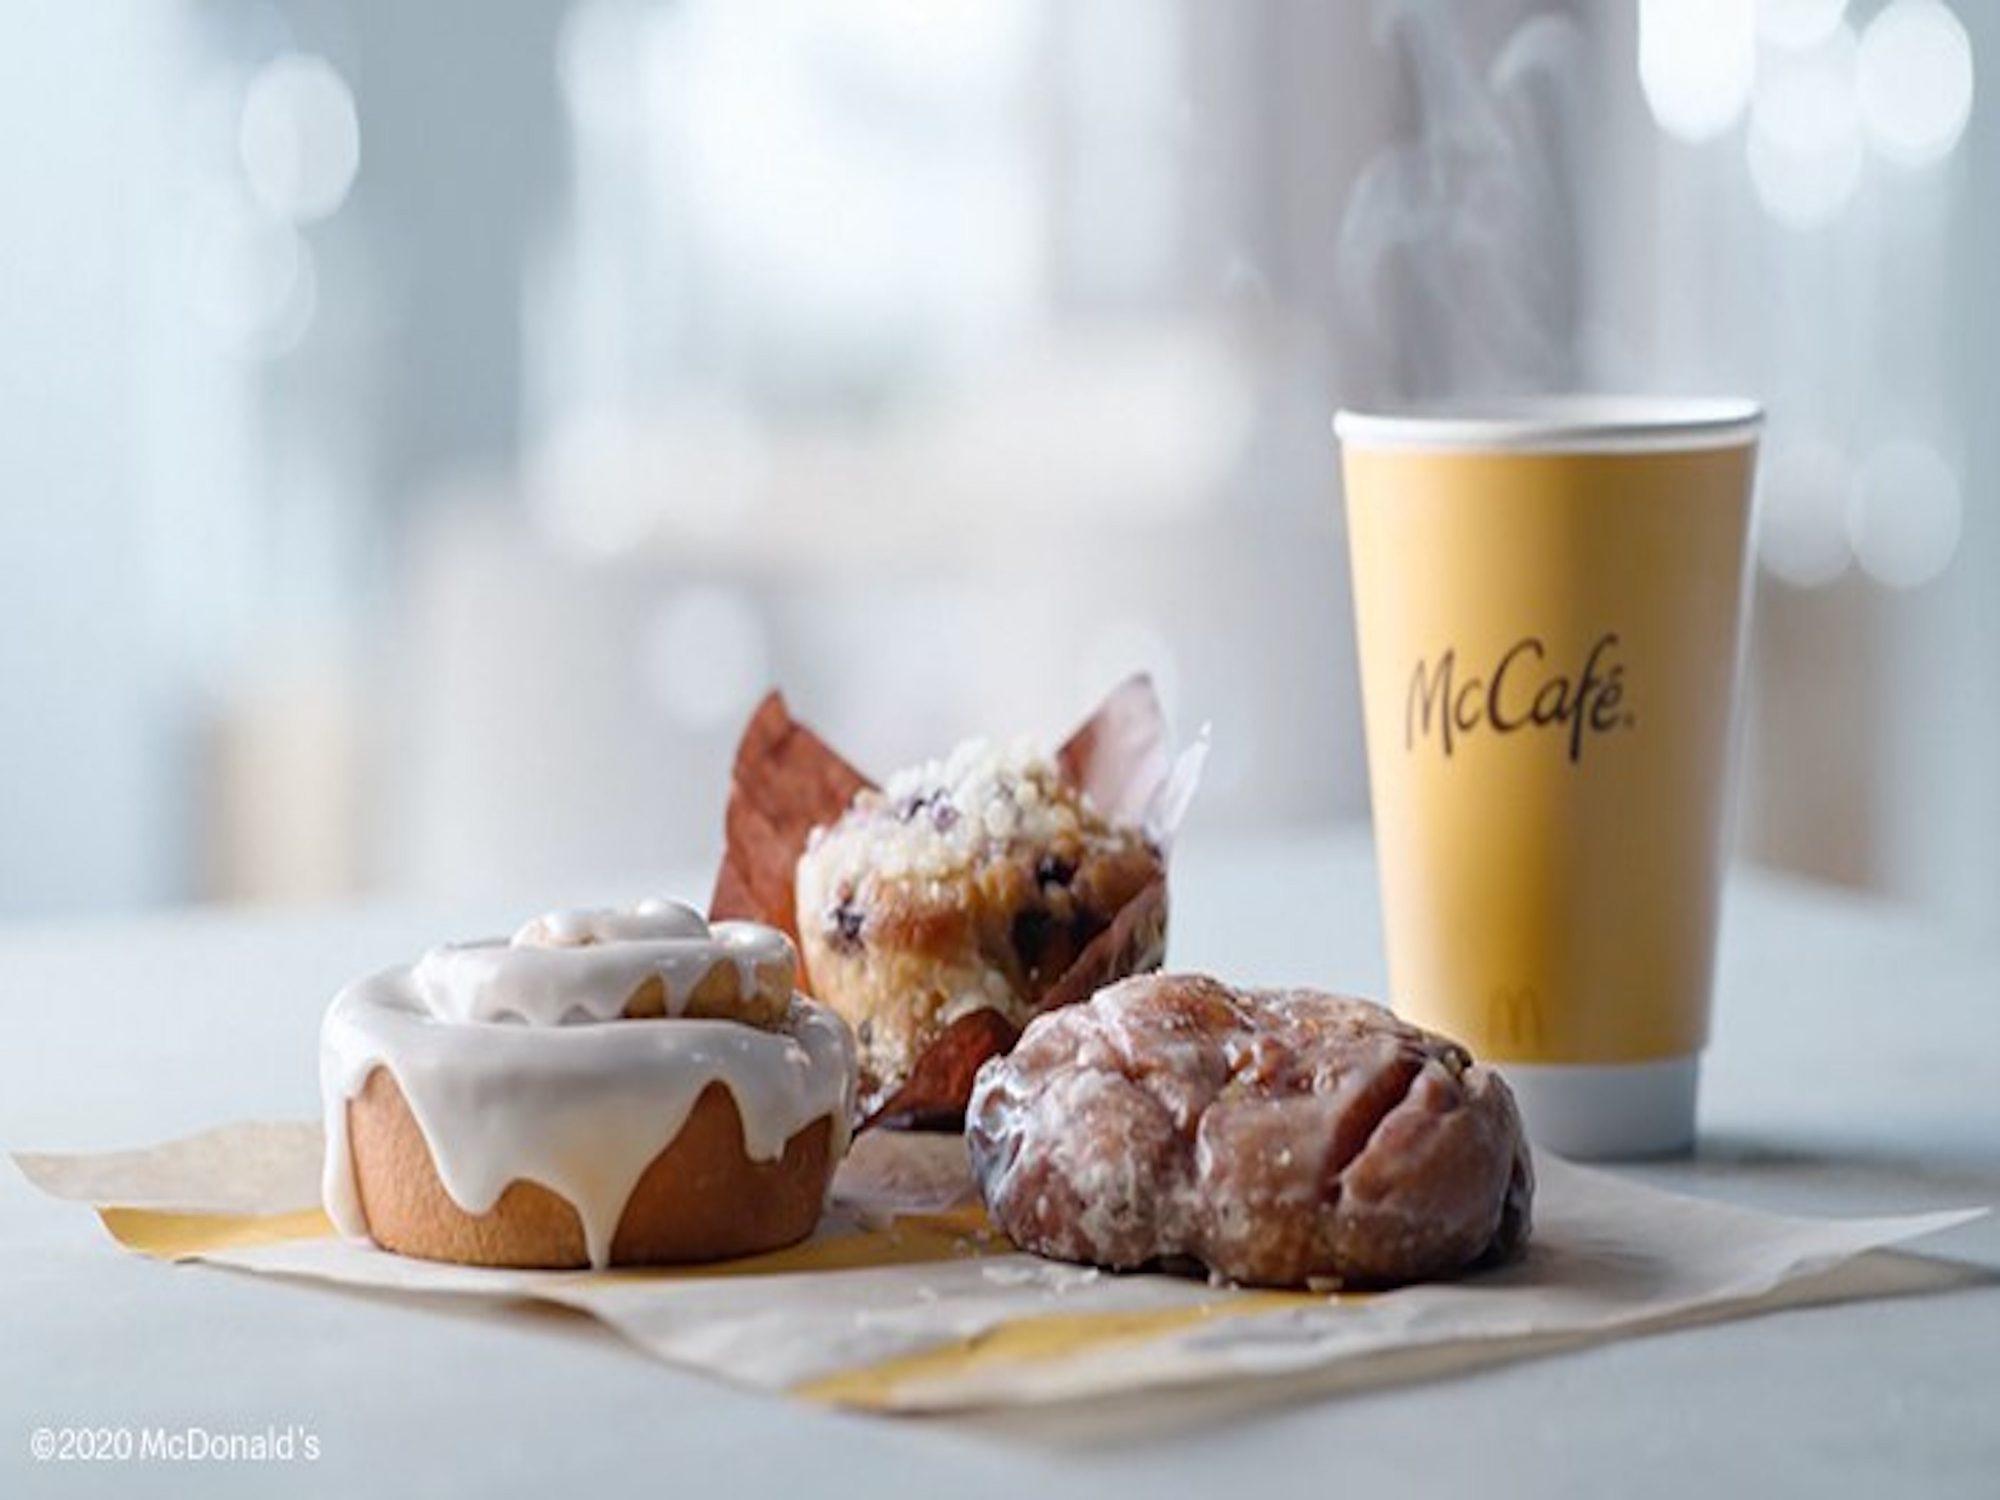 McCaf_Bakery_Lineup.jpg